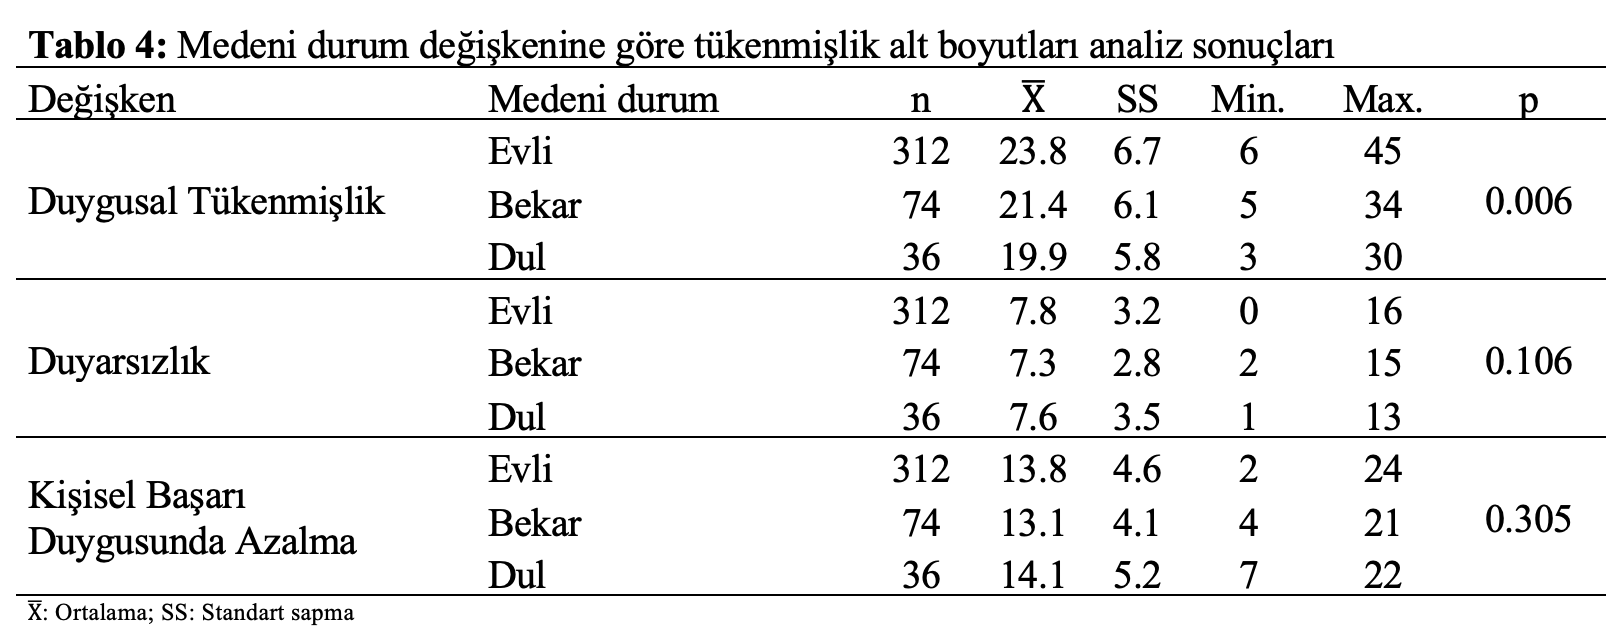 istatistiksel analiz medeni durum tukenmislik